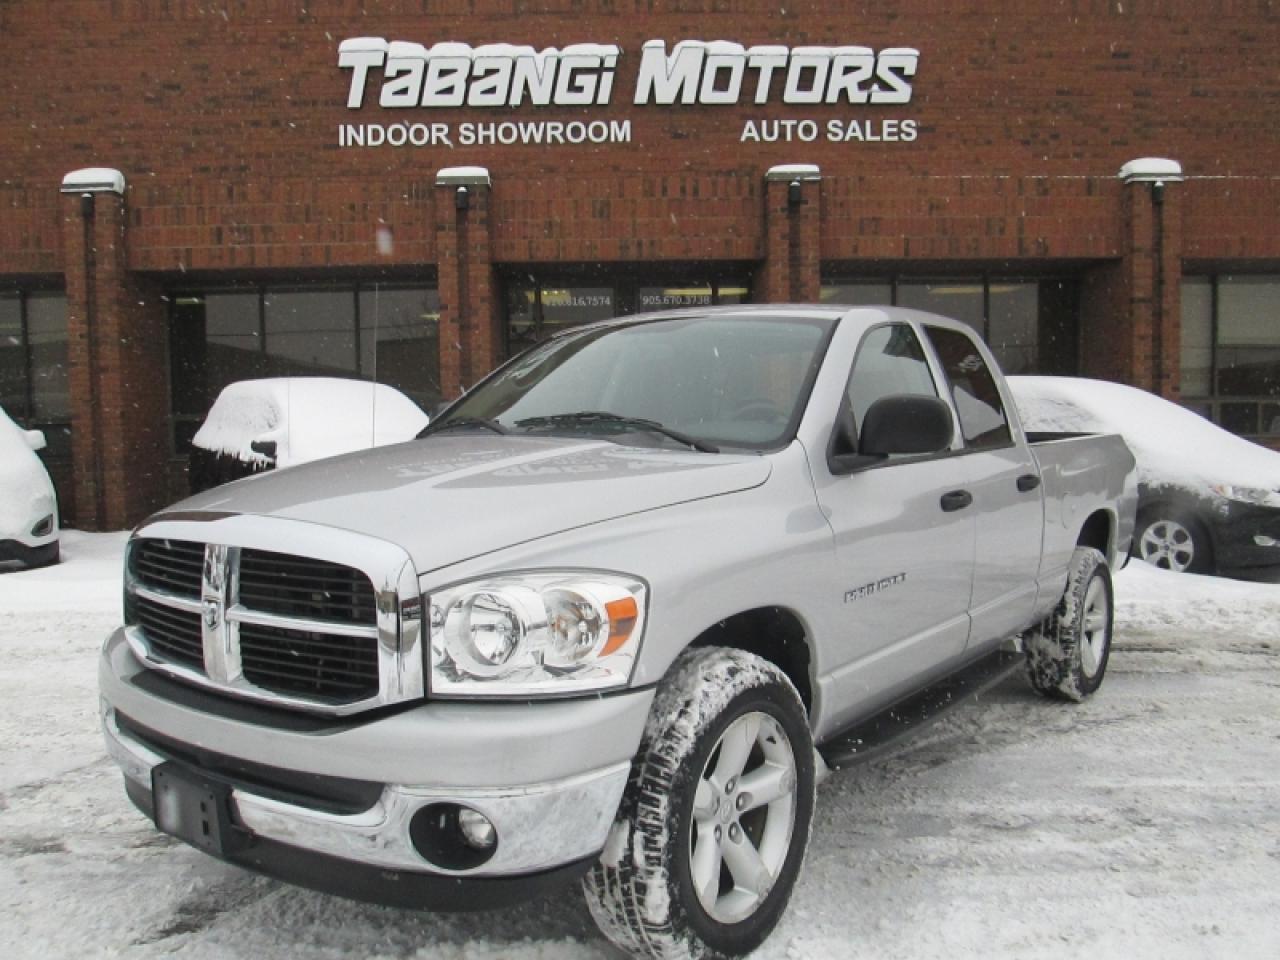 Photo of Silver 2007 Dodge Ram 1500